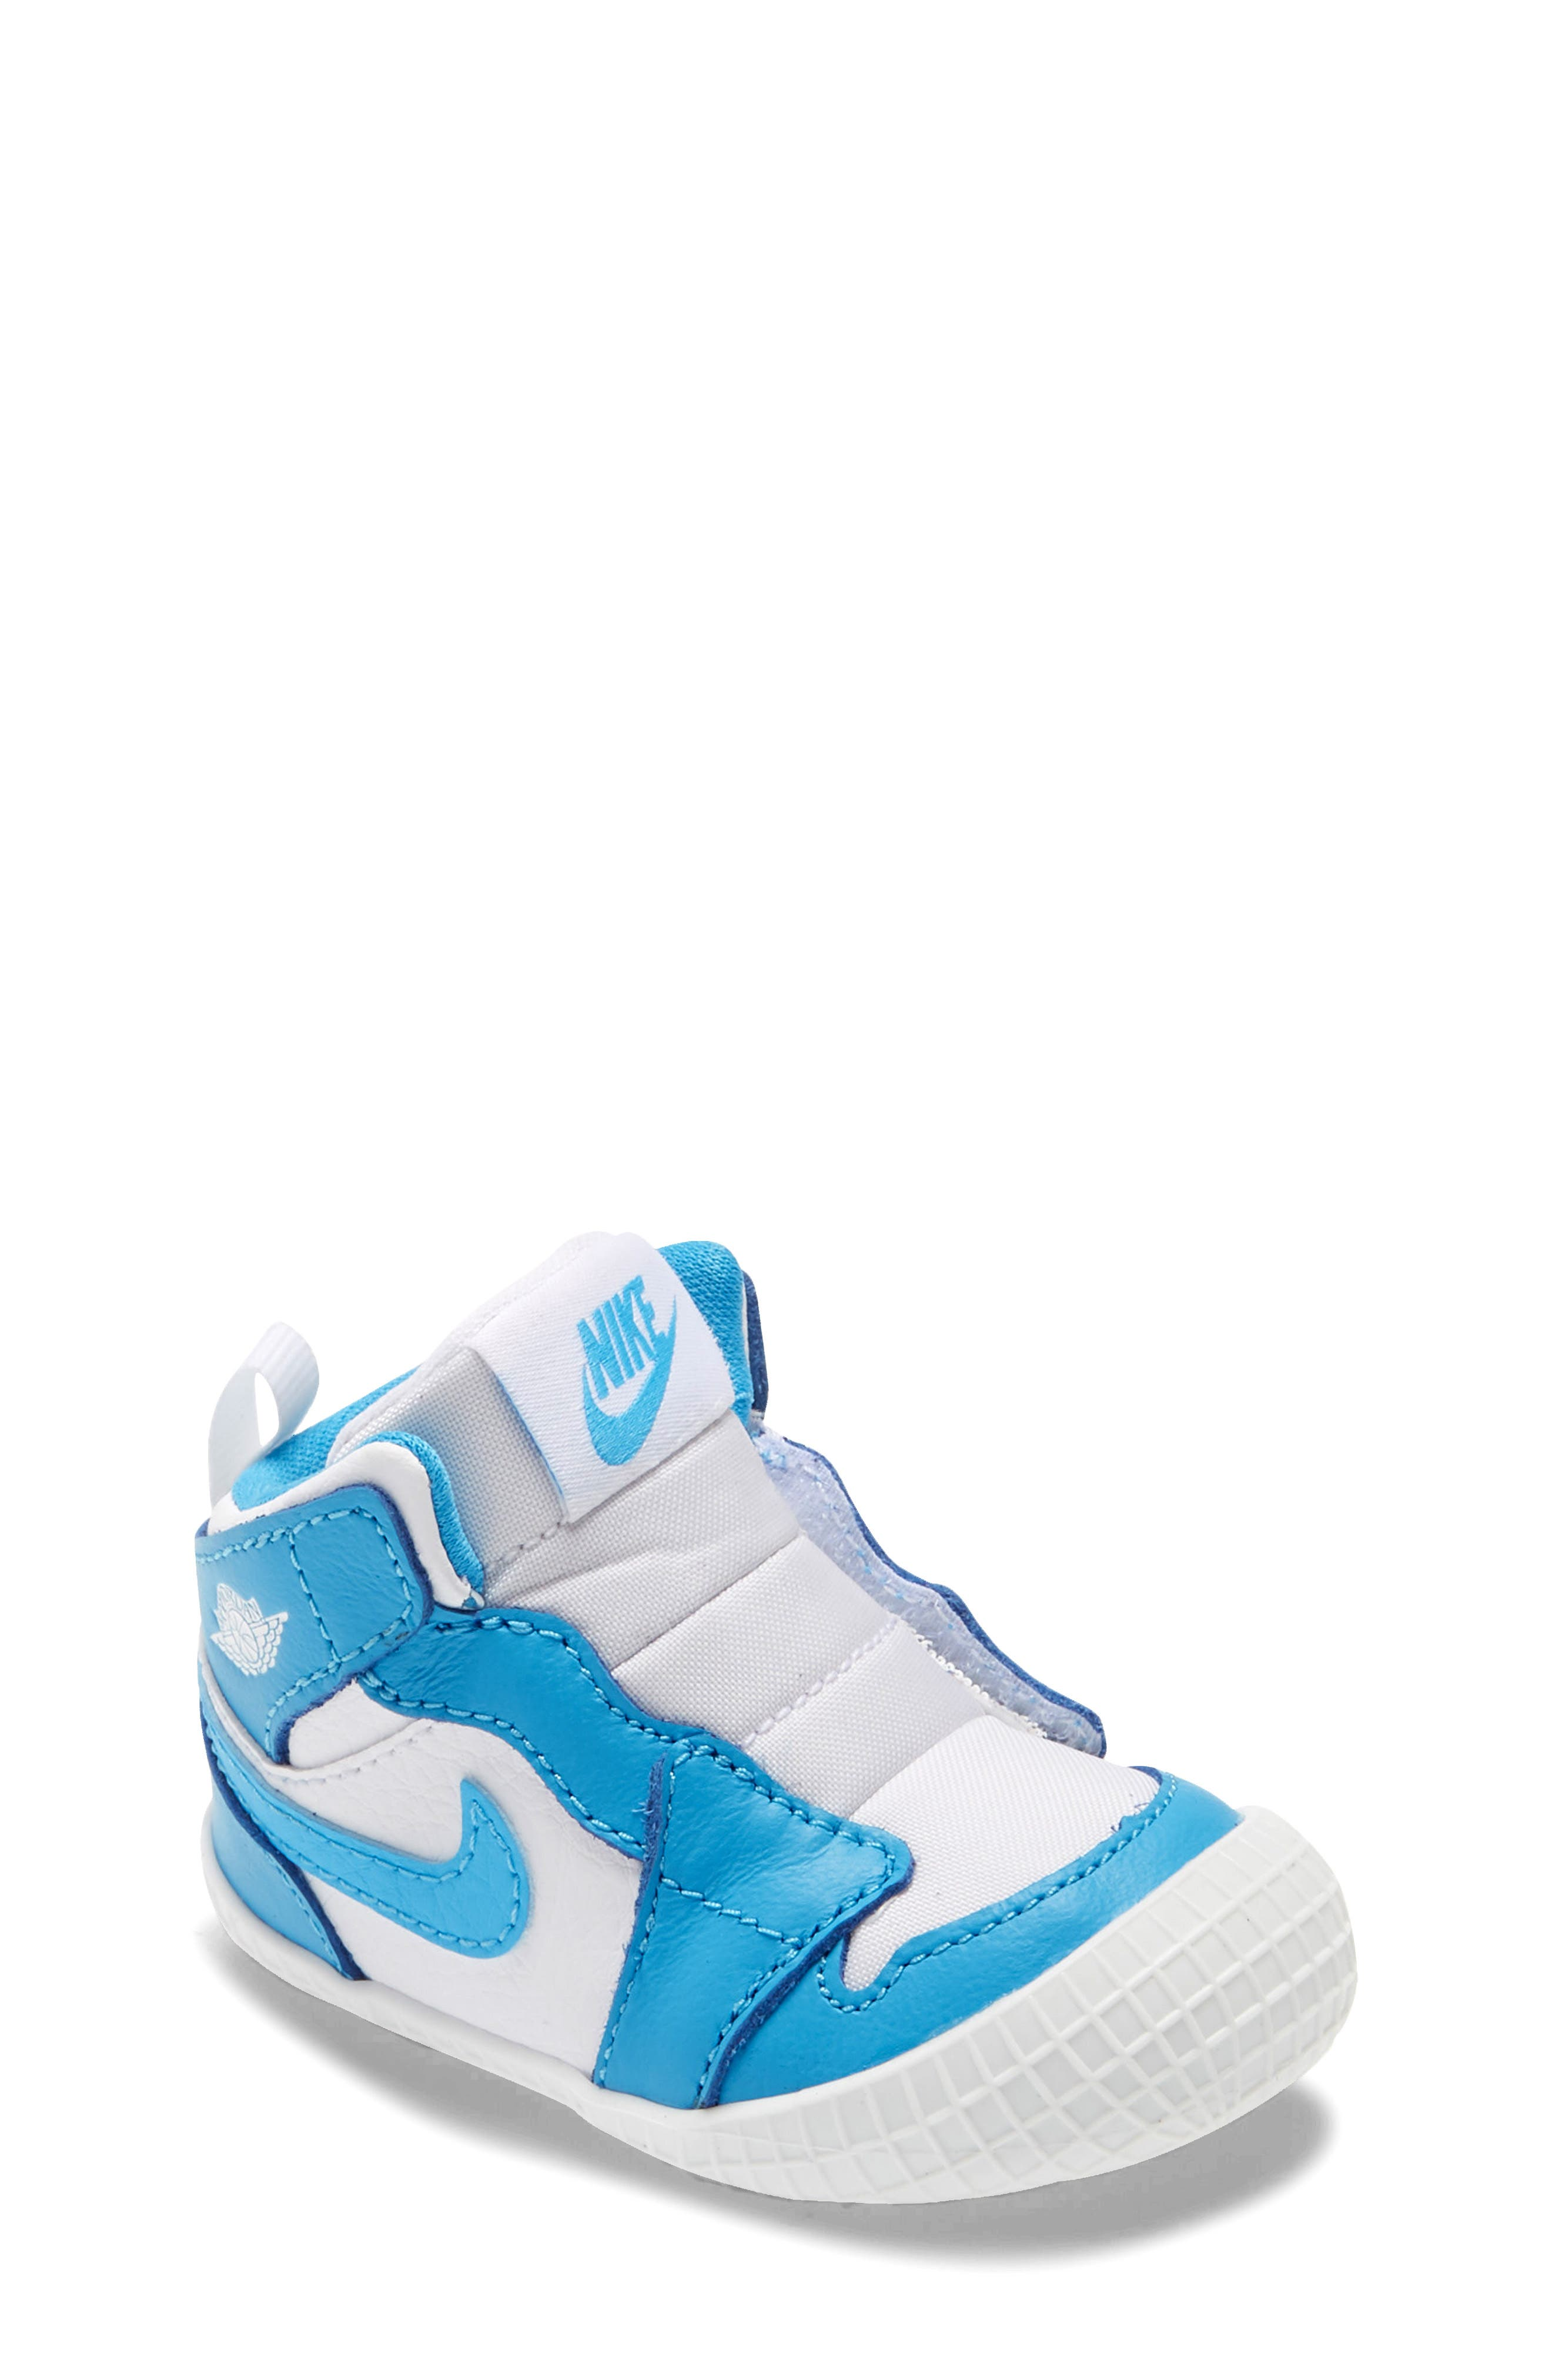 jordans for babies size 4